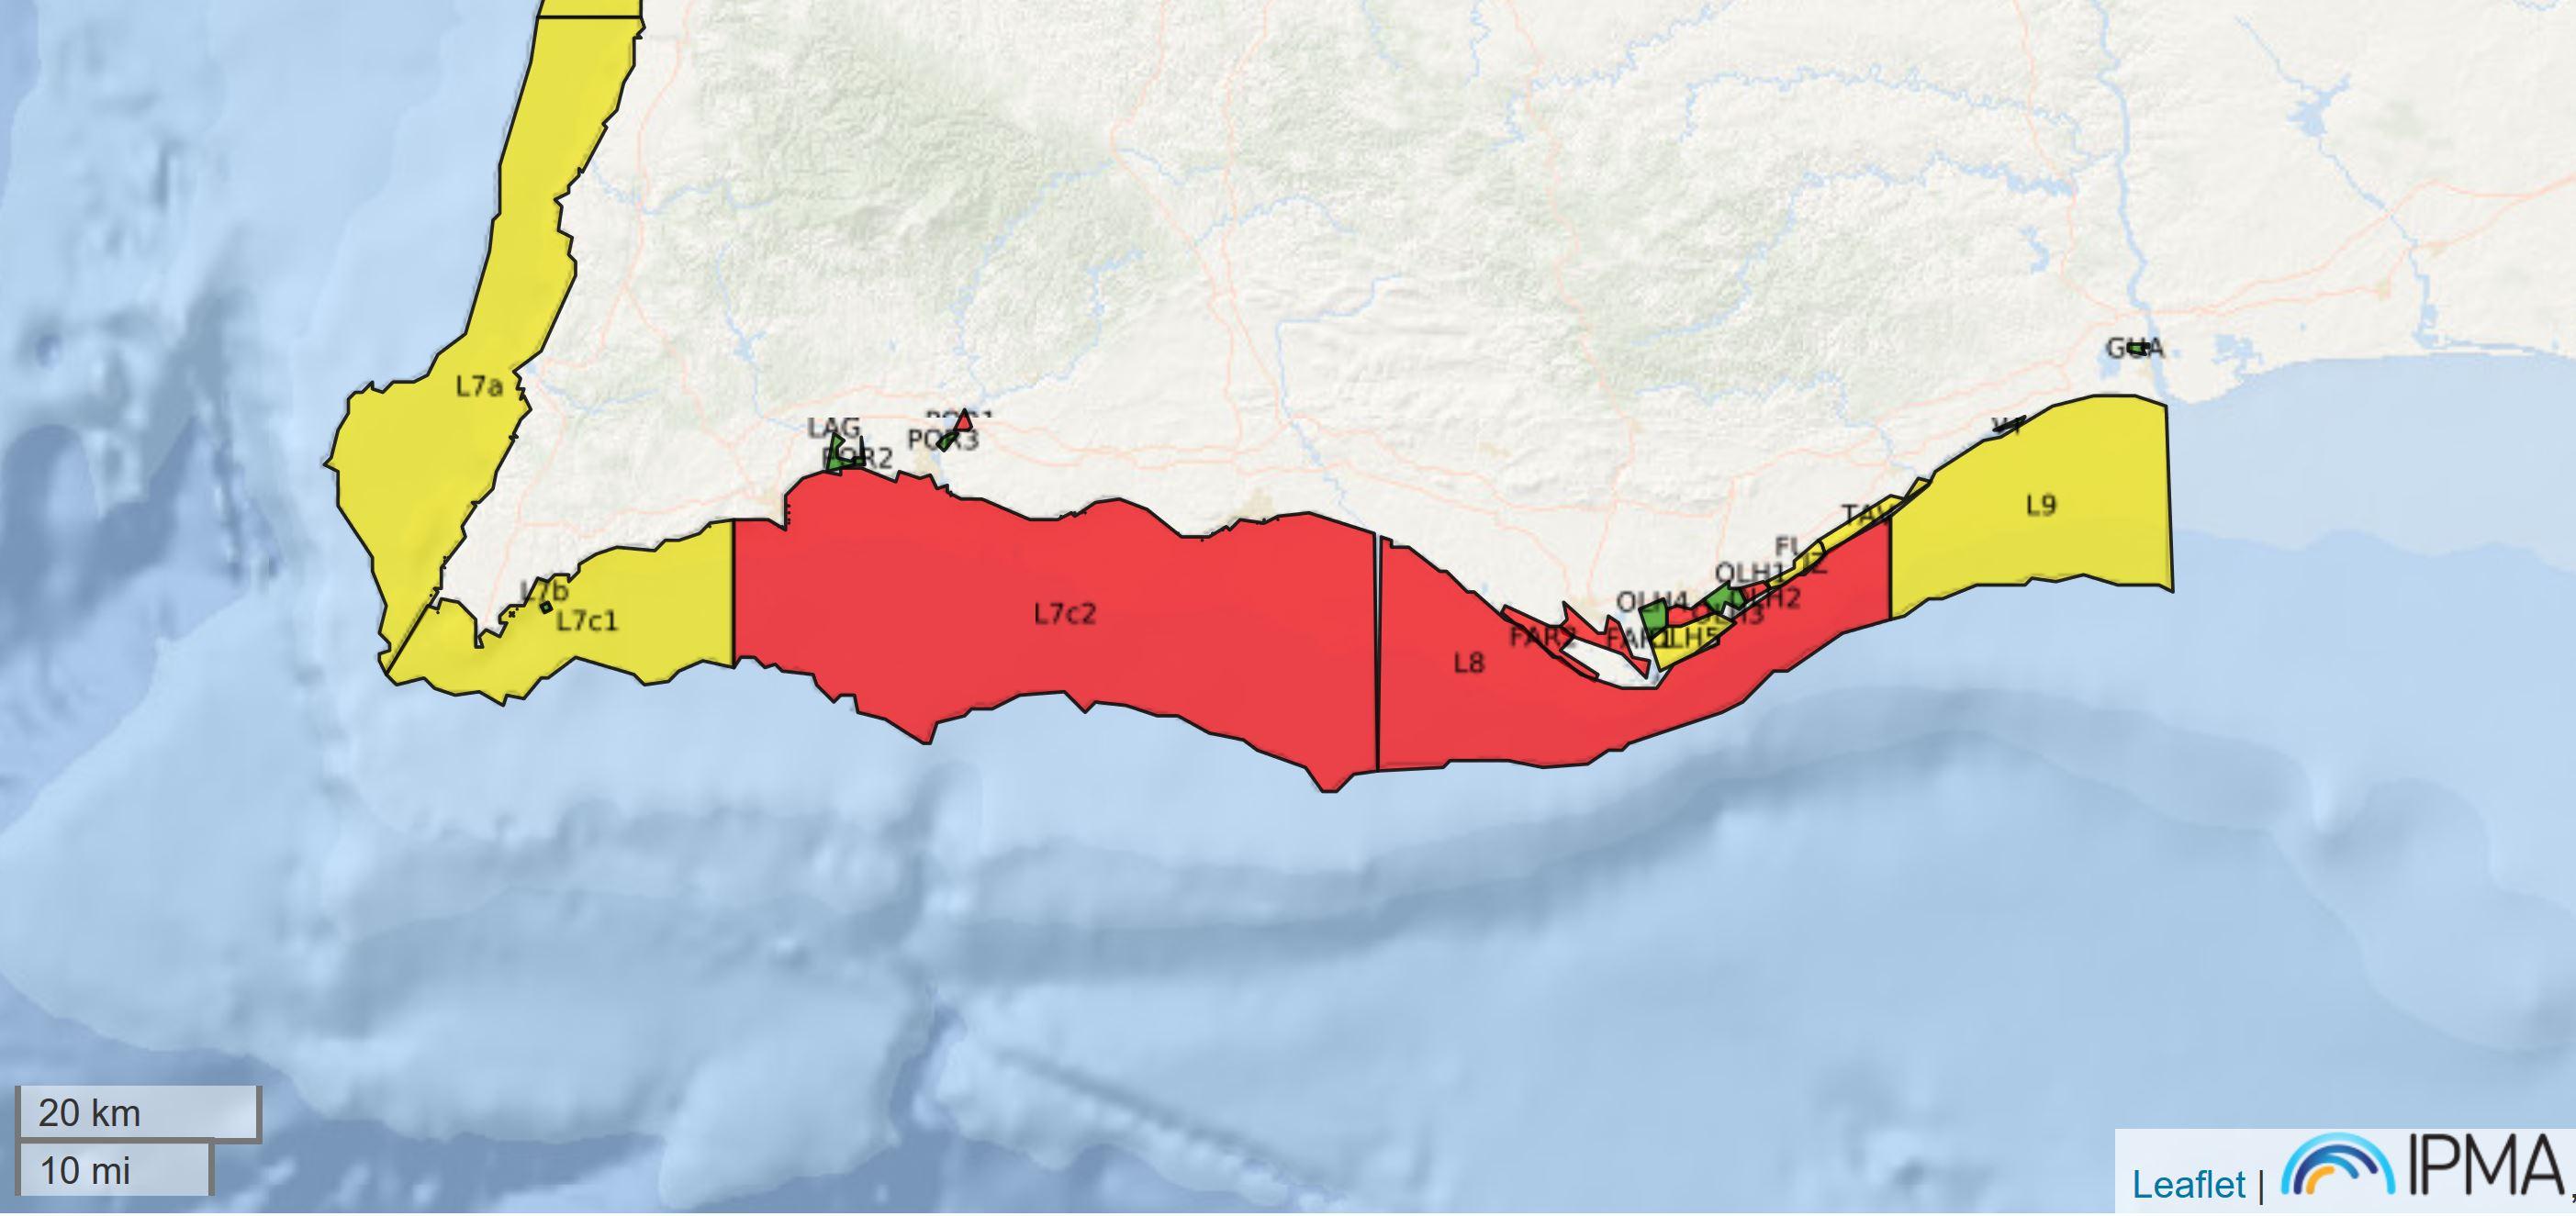 Flughafen Algarve Karte.Algarve News 17 Bis 23 Juni 2019 Algarve Für Entdecker